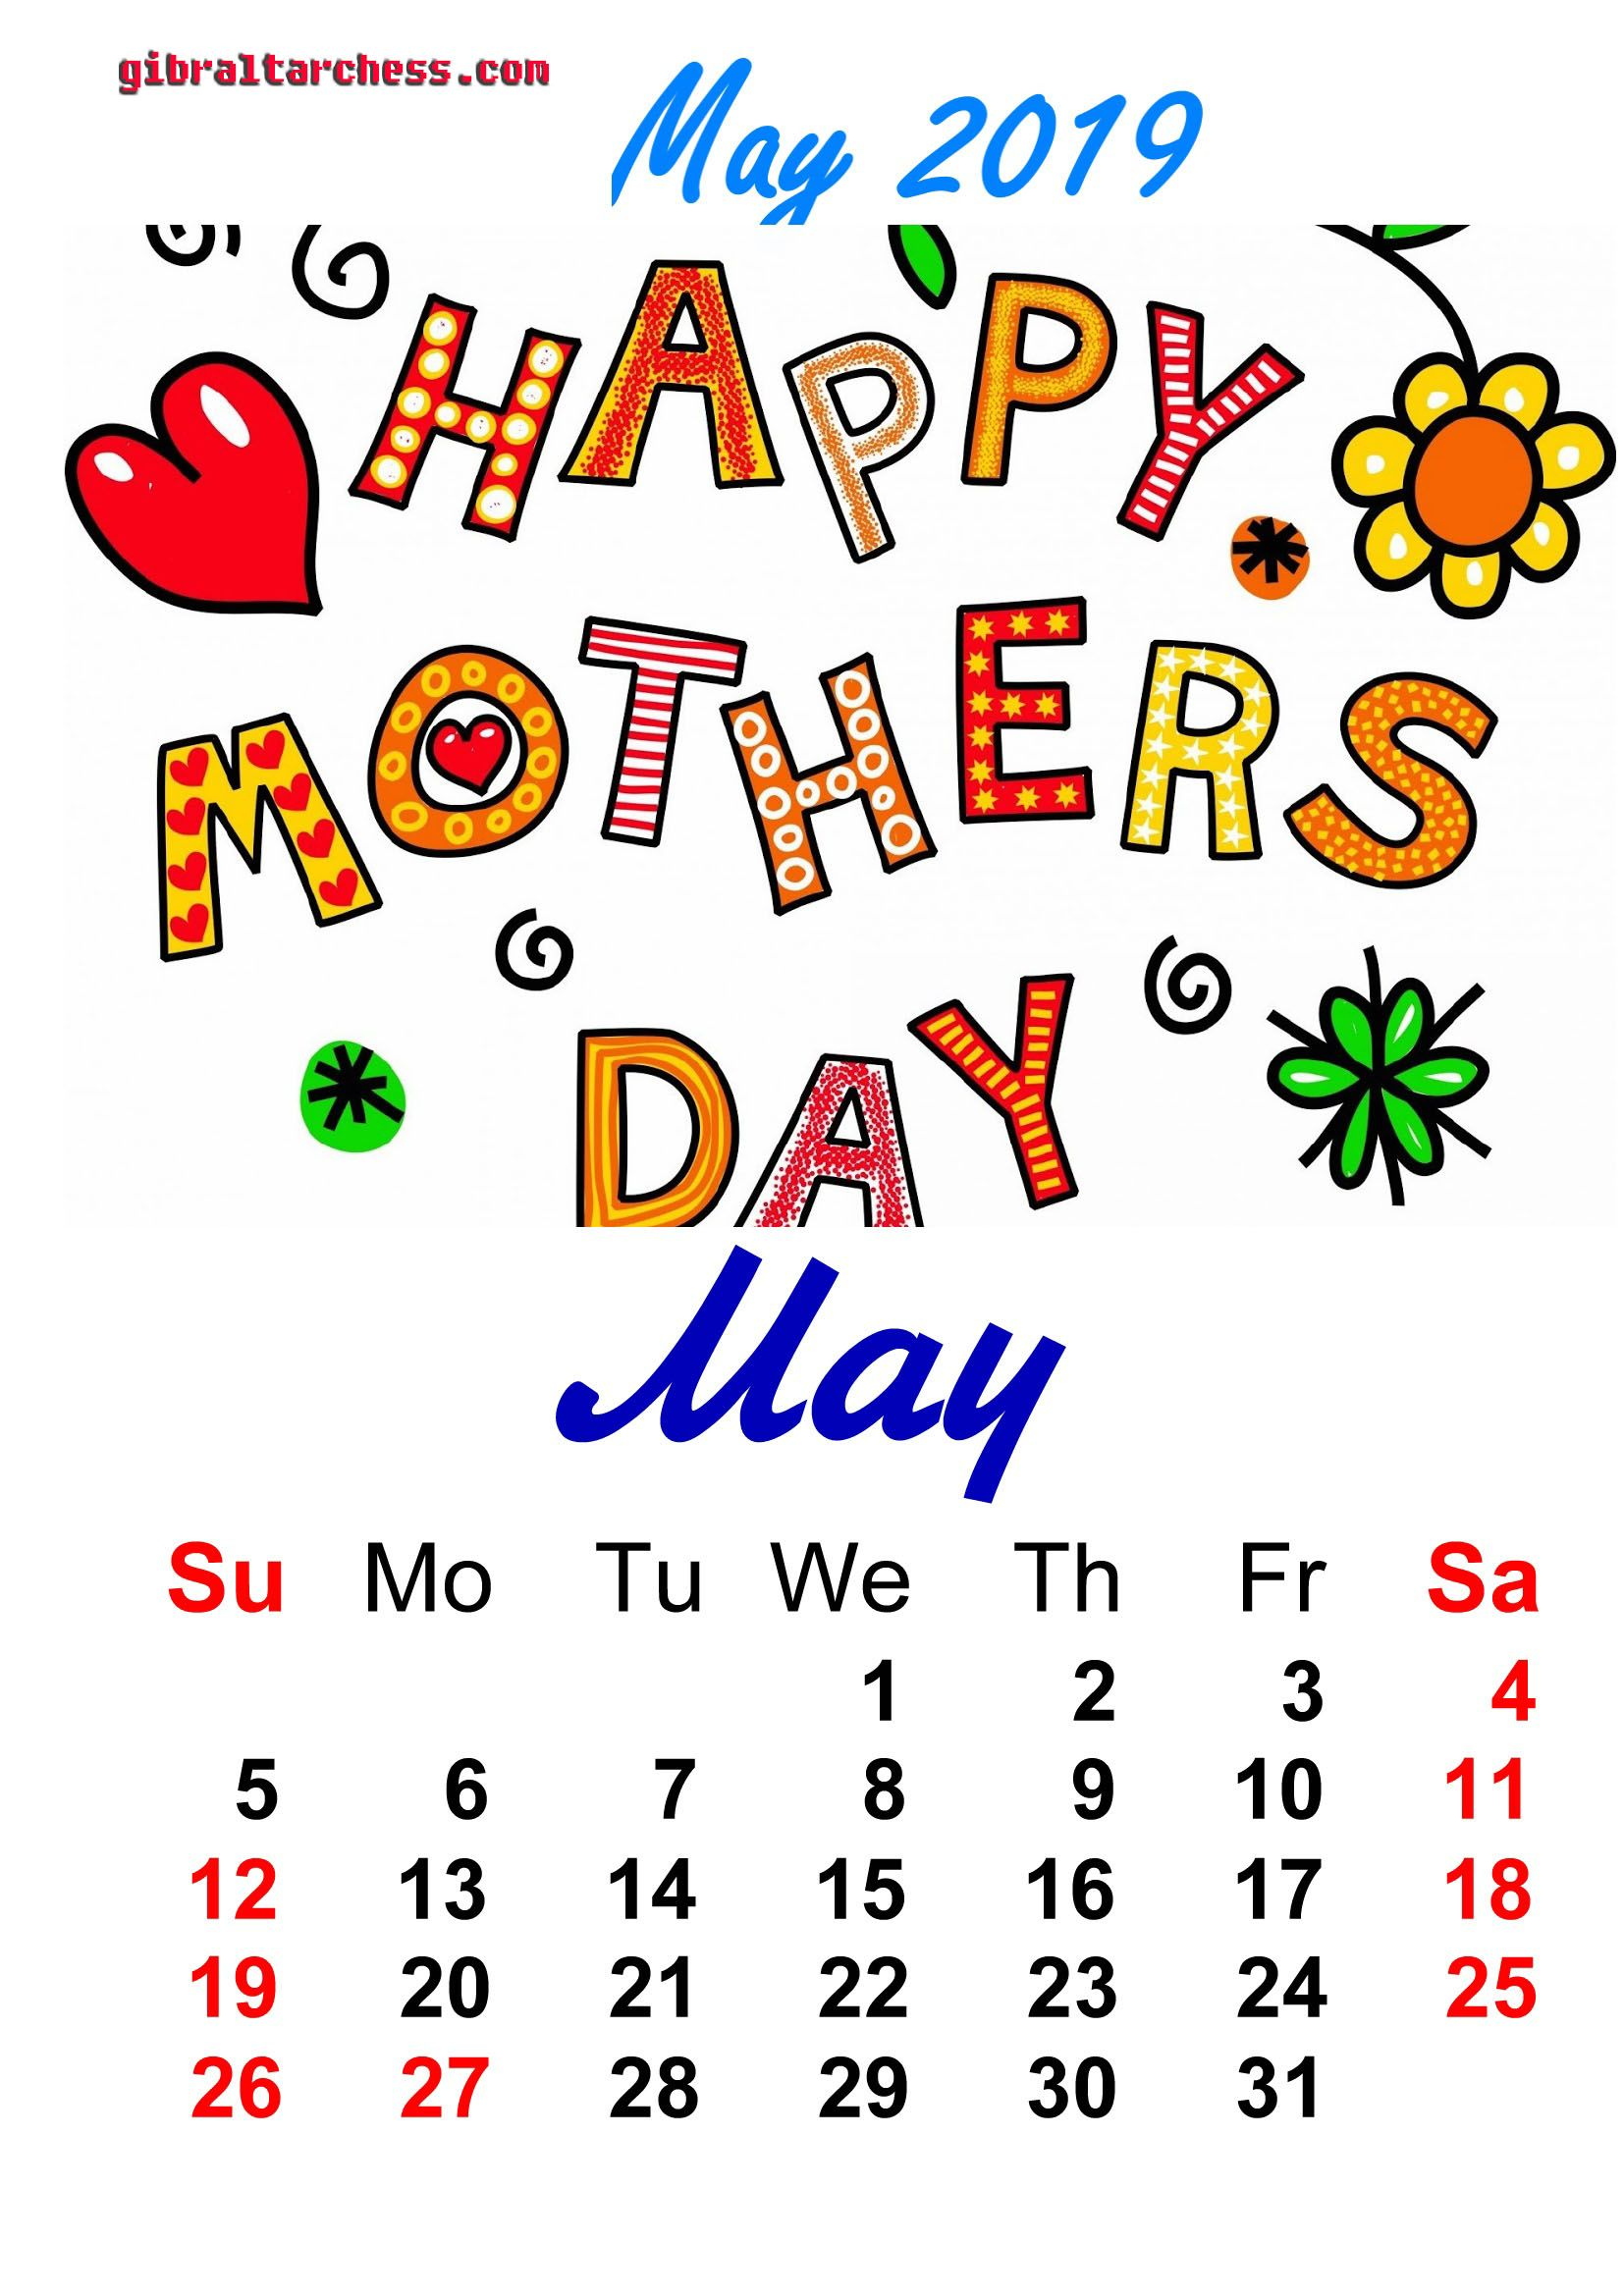 May 2019 Holidays Calendar Holiday Calendar 2019 Calendar